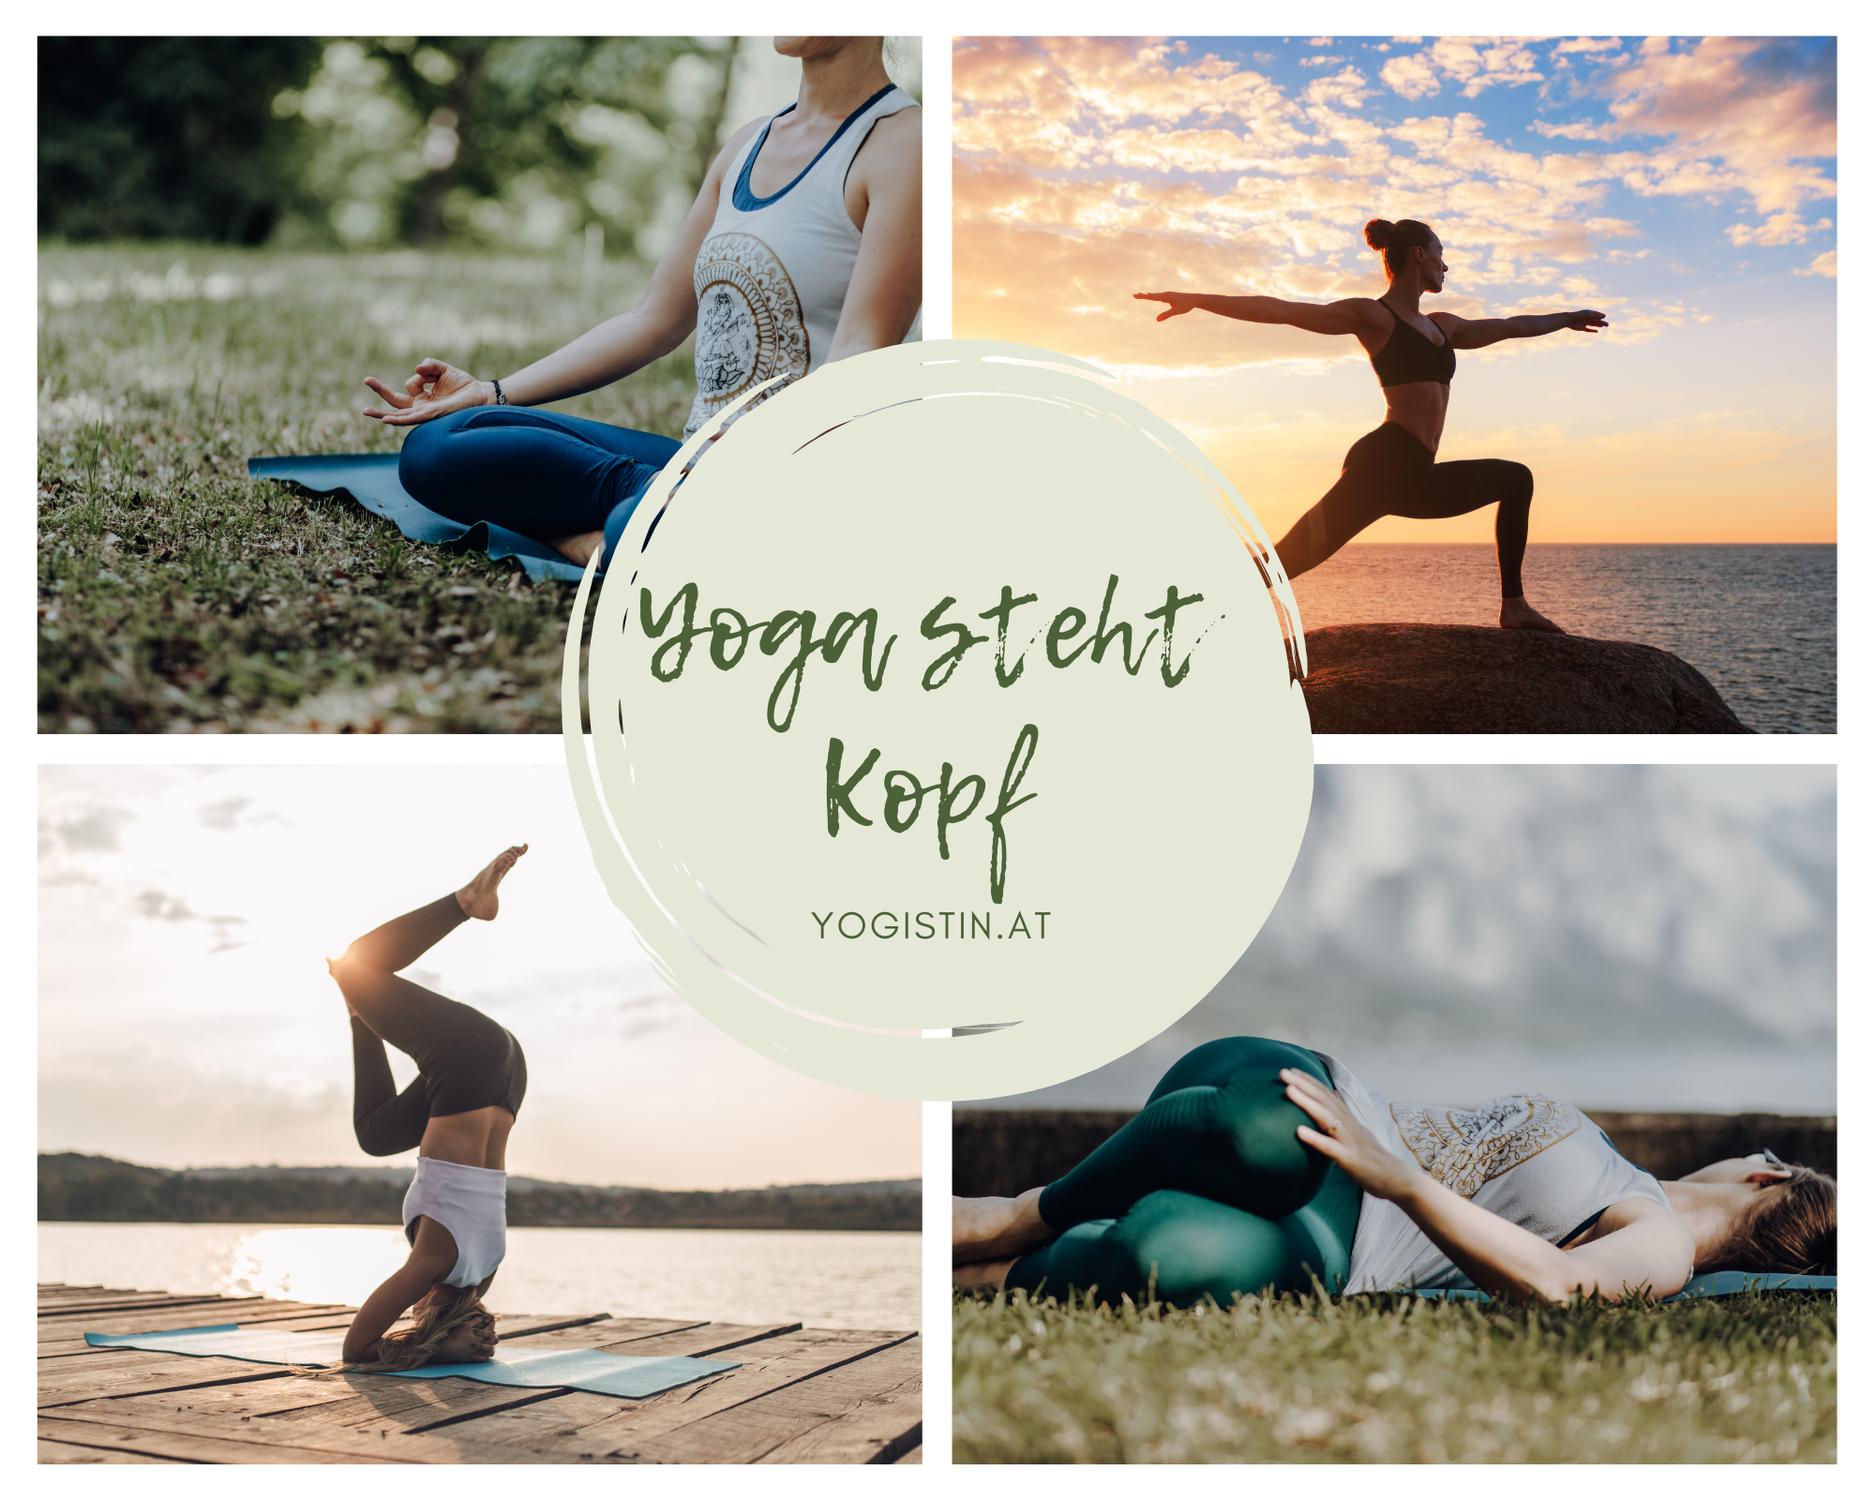 Yoga steht Kopf